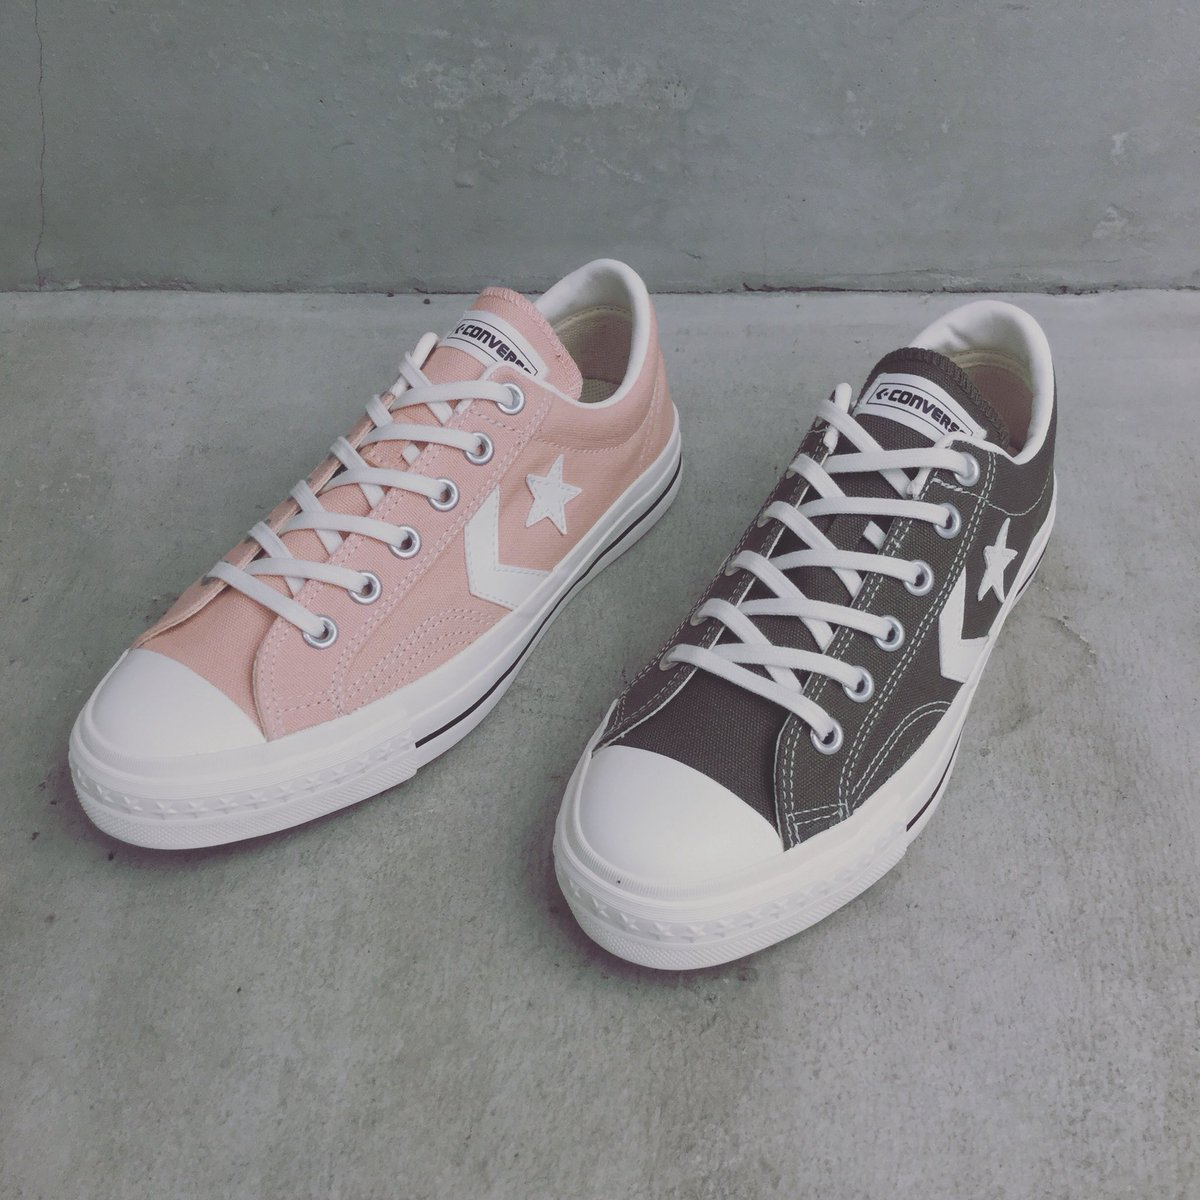 24e5de282eeae converse sneakers white hashtag on Twitter